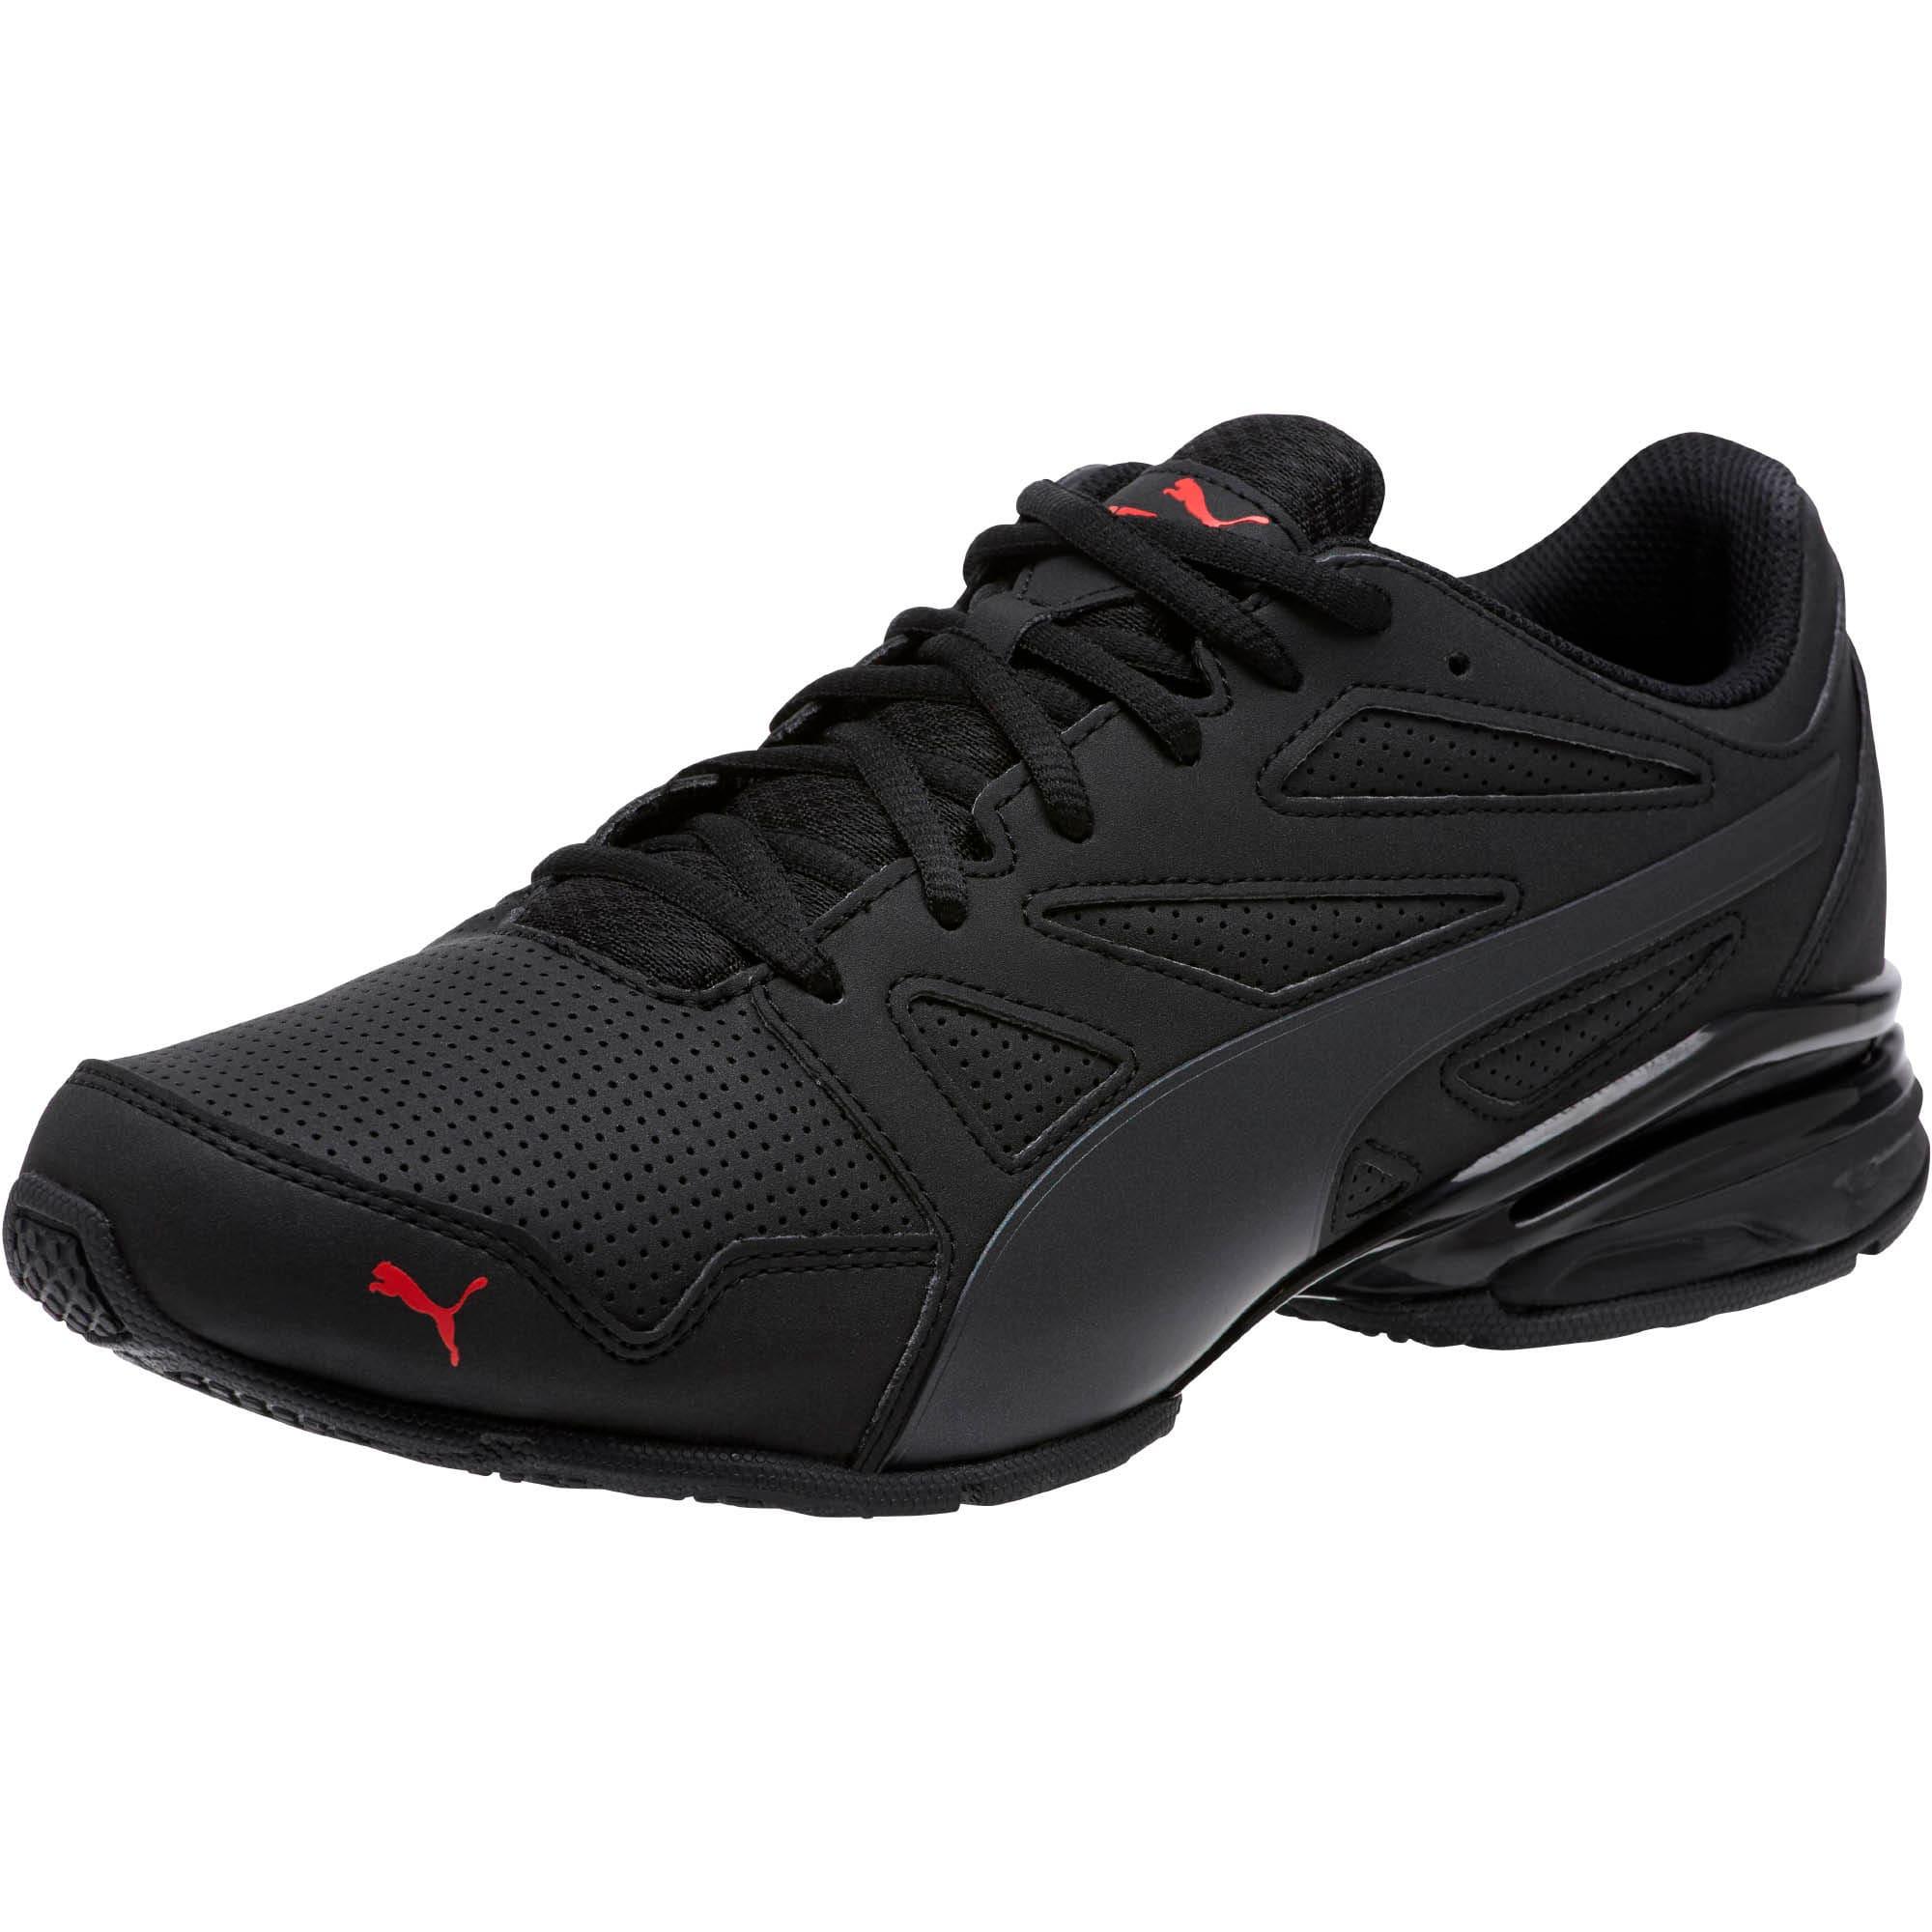 Thumbnail 1 of Tazon Modern SL FM Men's Sneakers, Puma Black-high risk red, medium